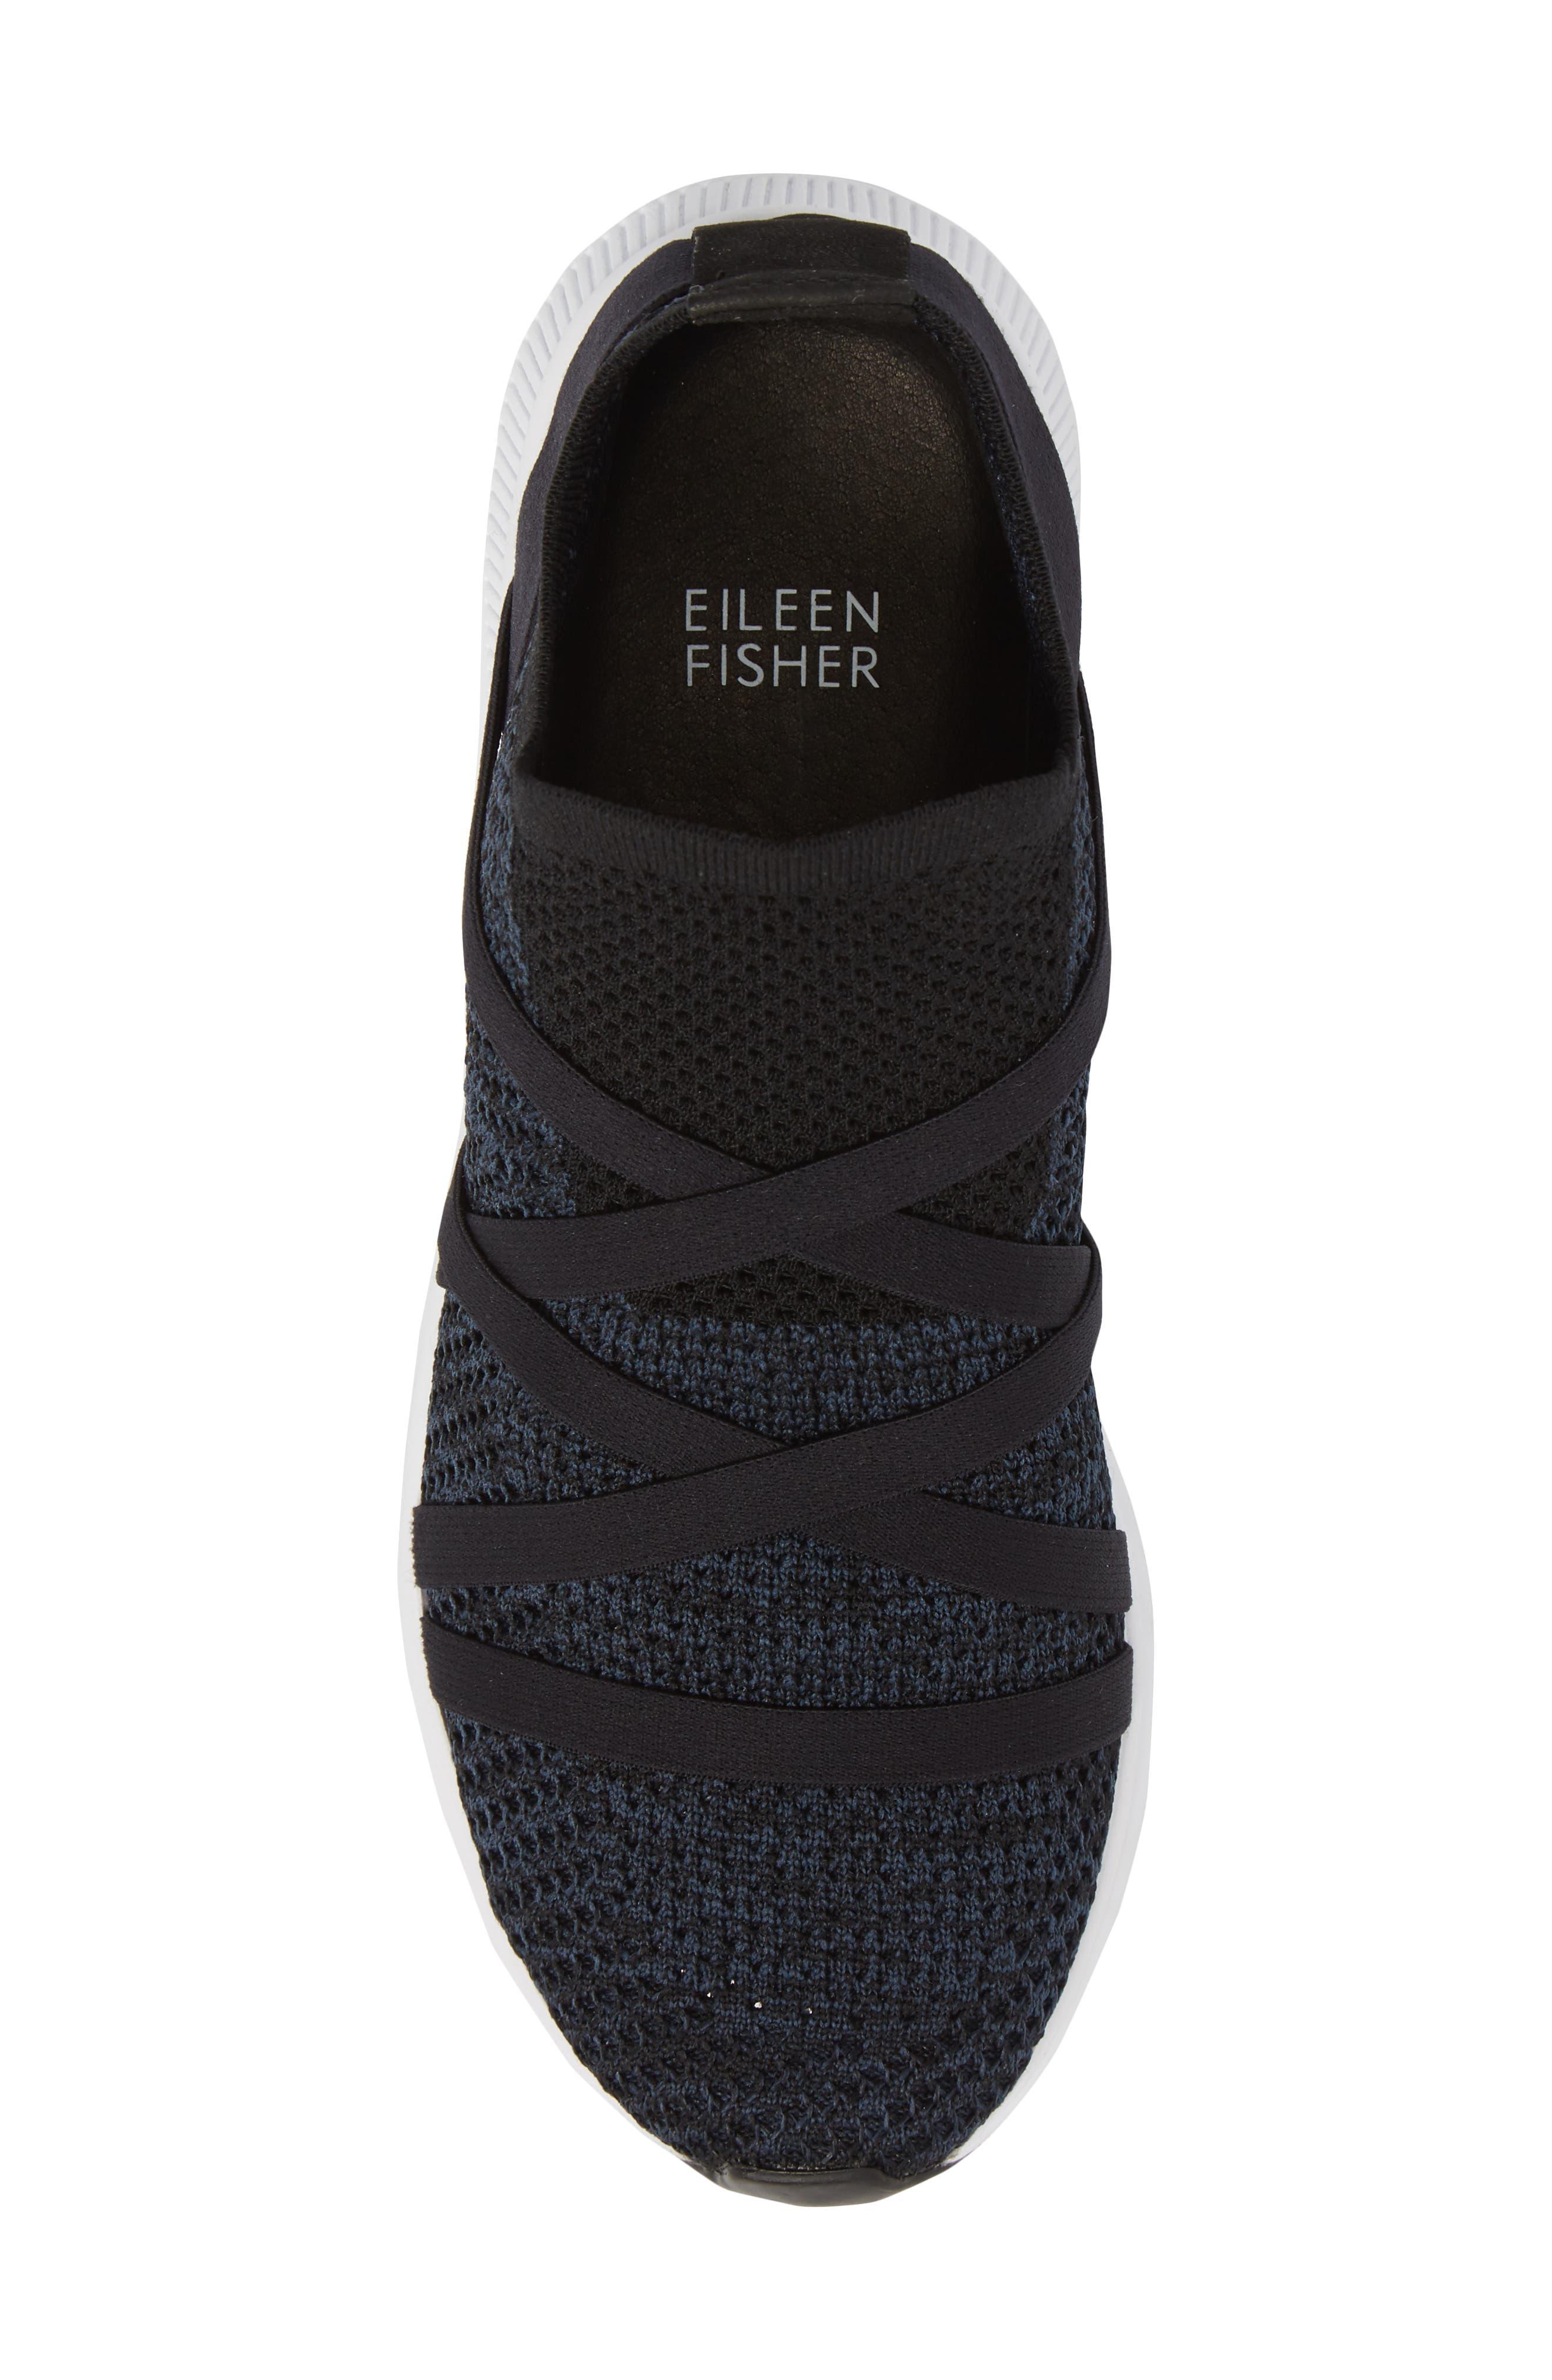 Xanady Woven Slip-On Sneaker,                             Alternate thumbnail 5, color,                             BLACK/ MARINE STRETCH